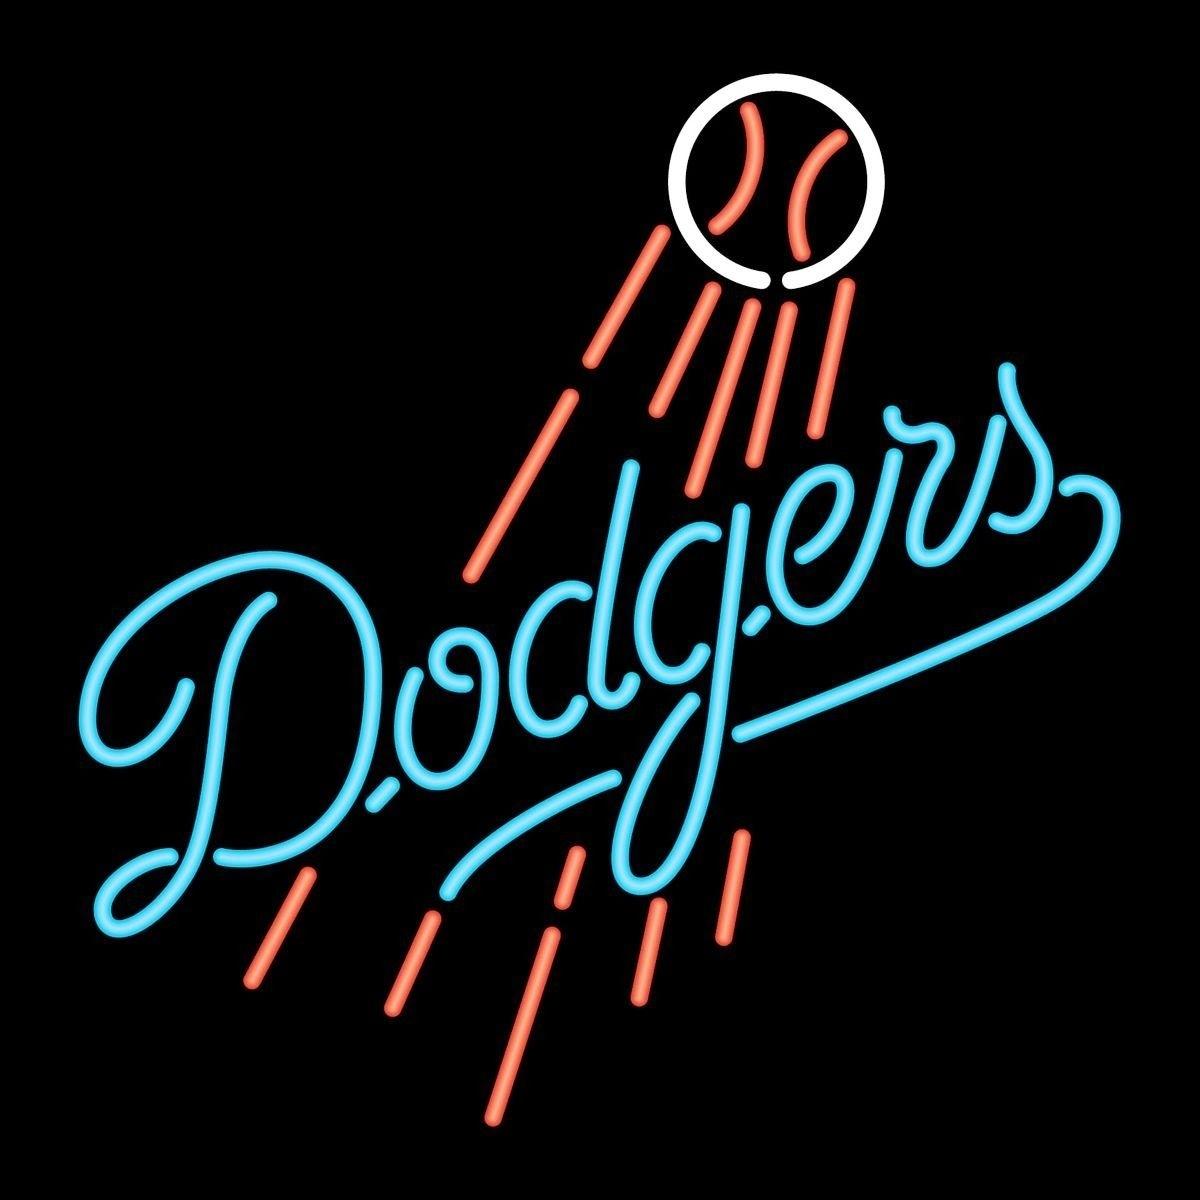 los dodgers wallpaper | los angeles dodgers | pinterest | dodgers